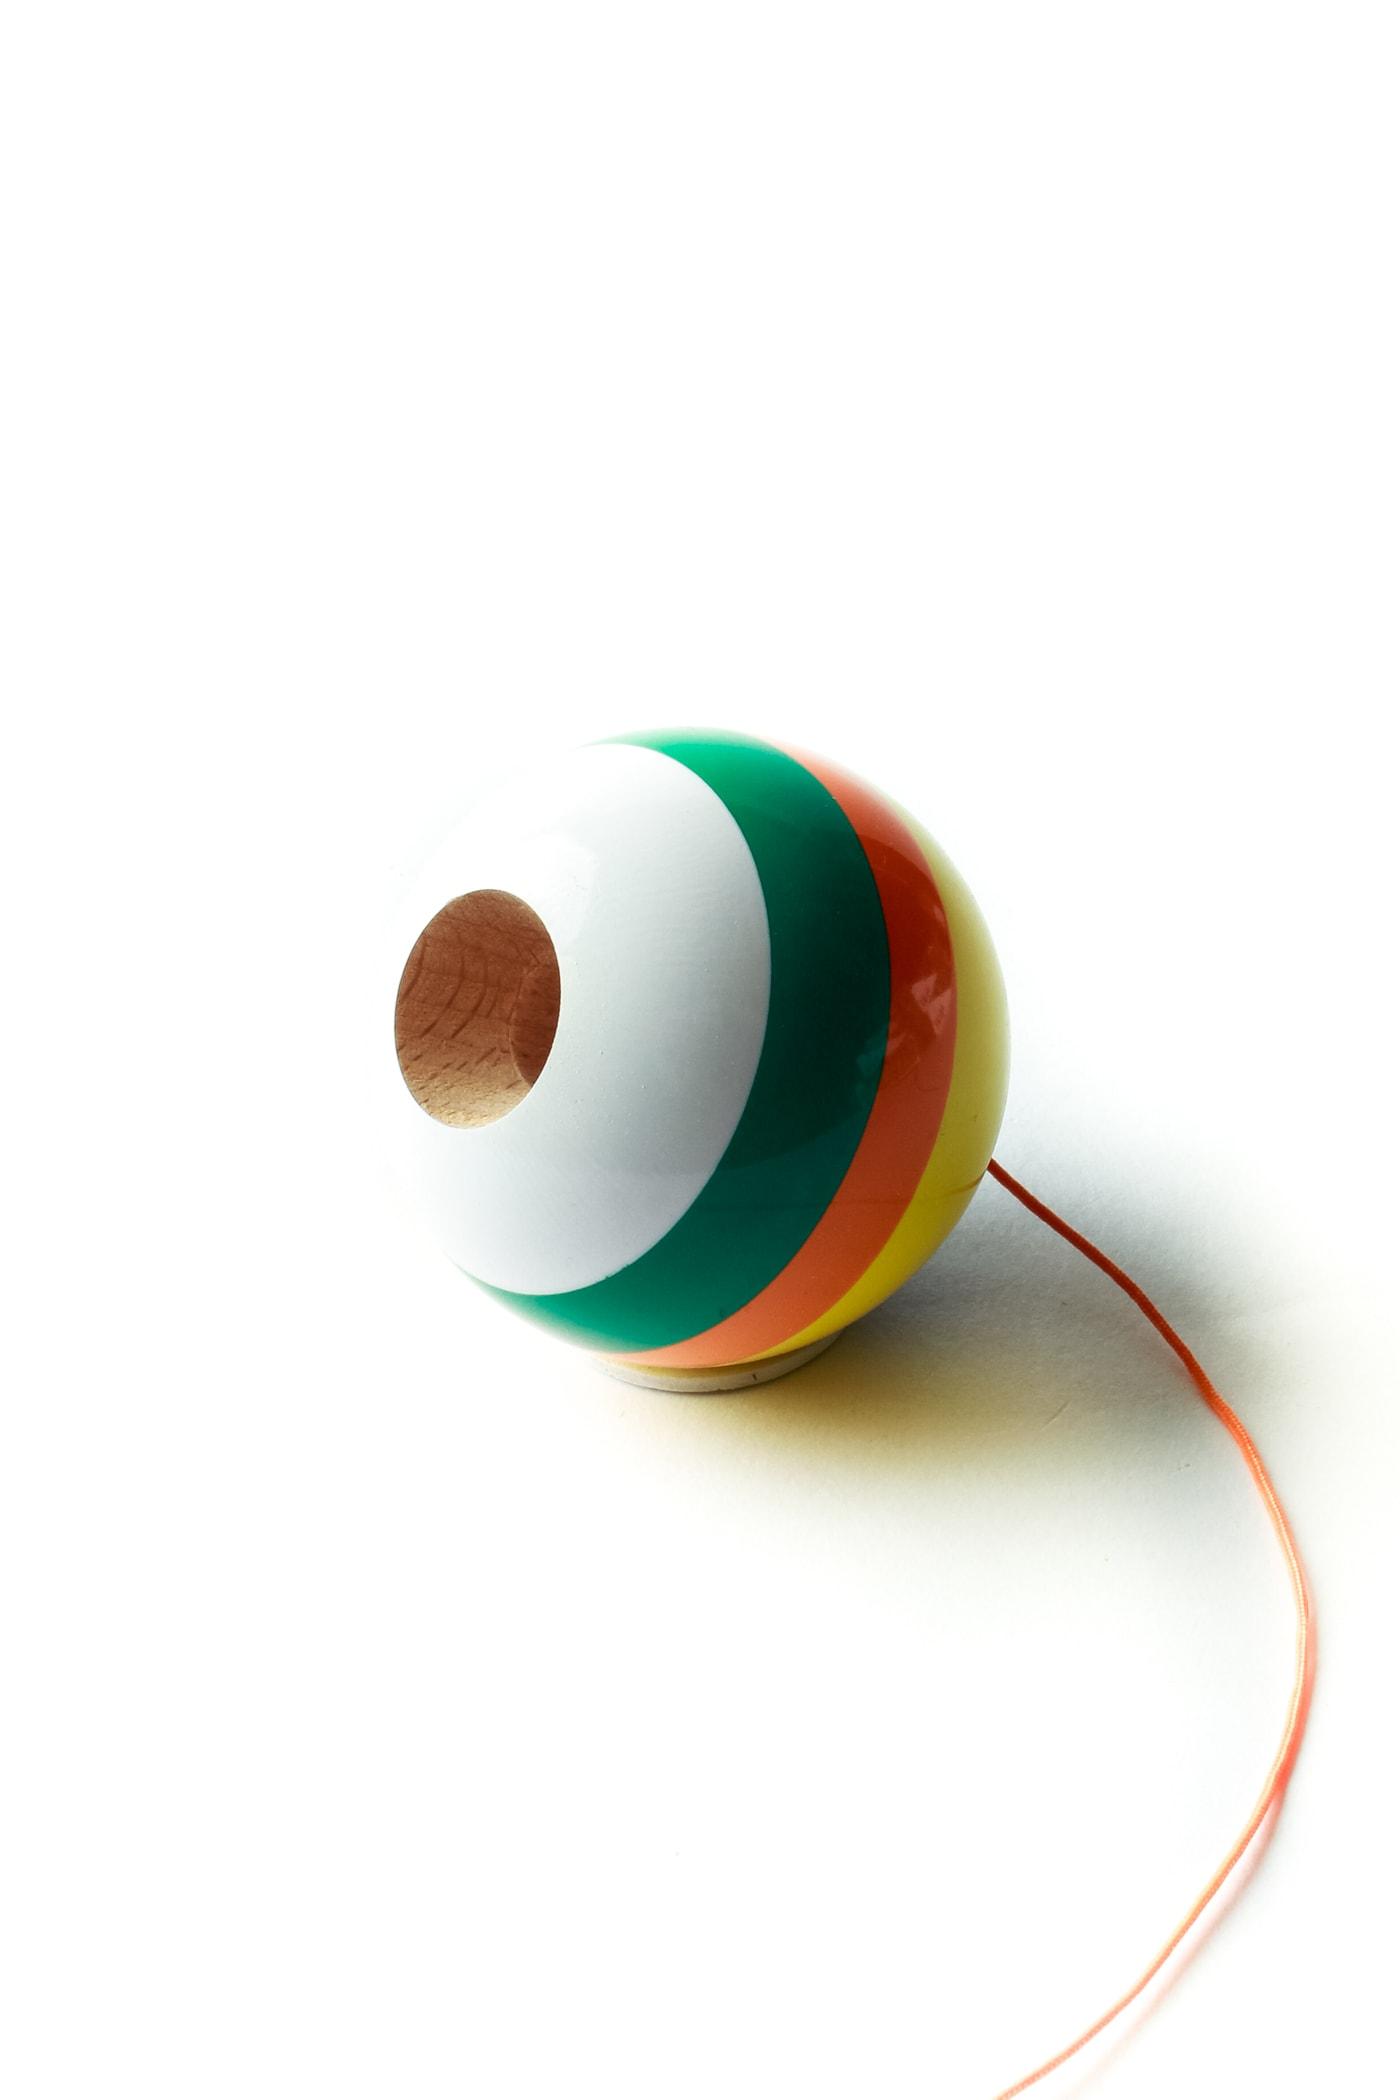 Joc de indemanare - Sweets Kendama - Prime – 5 Stripes – Poncho   Sweets Kendamas